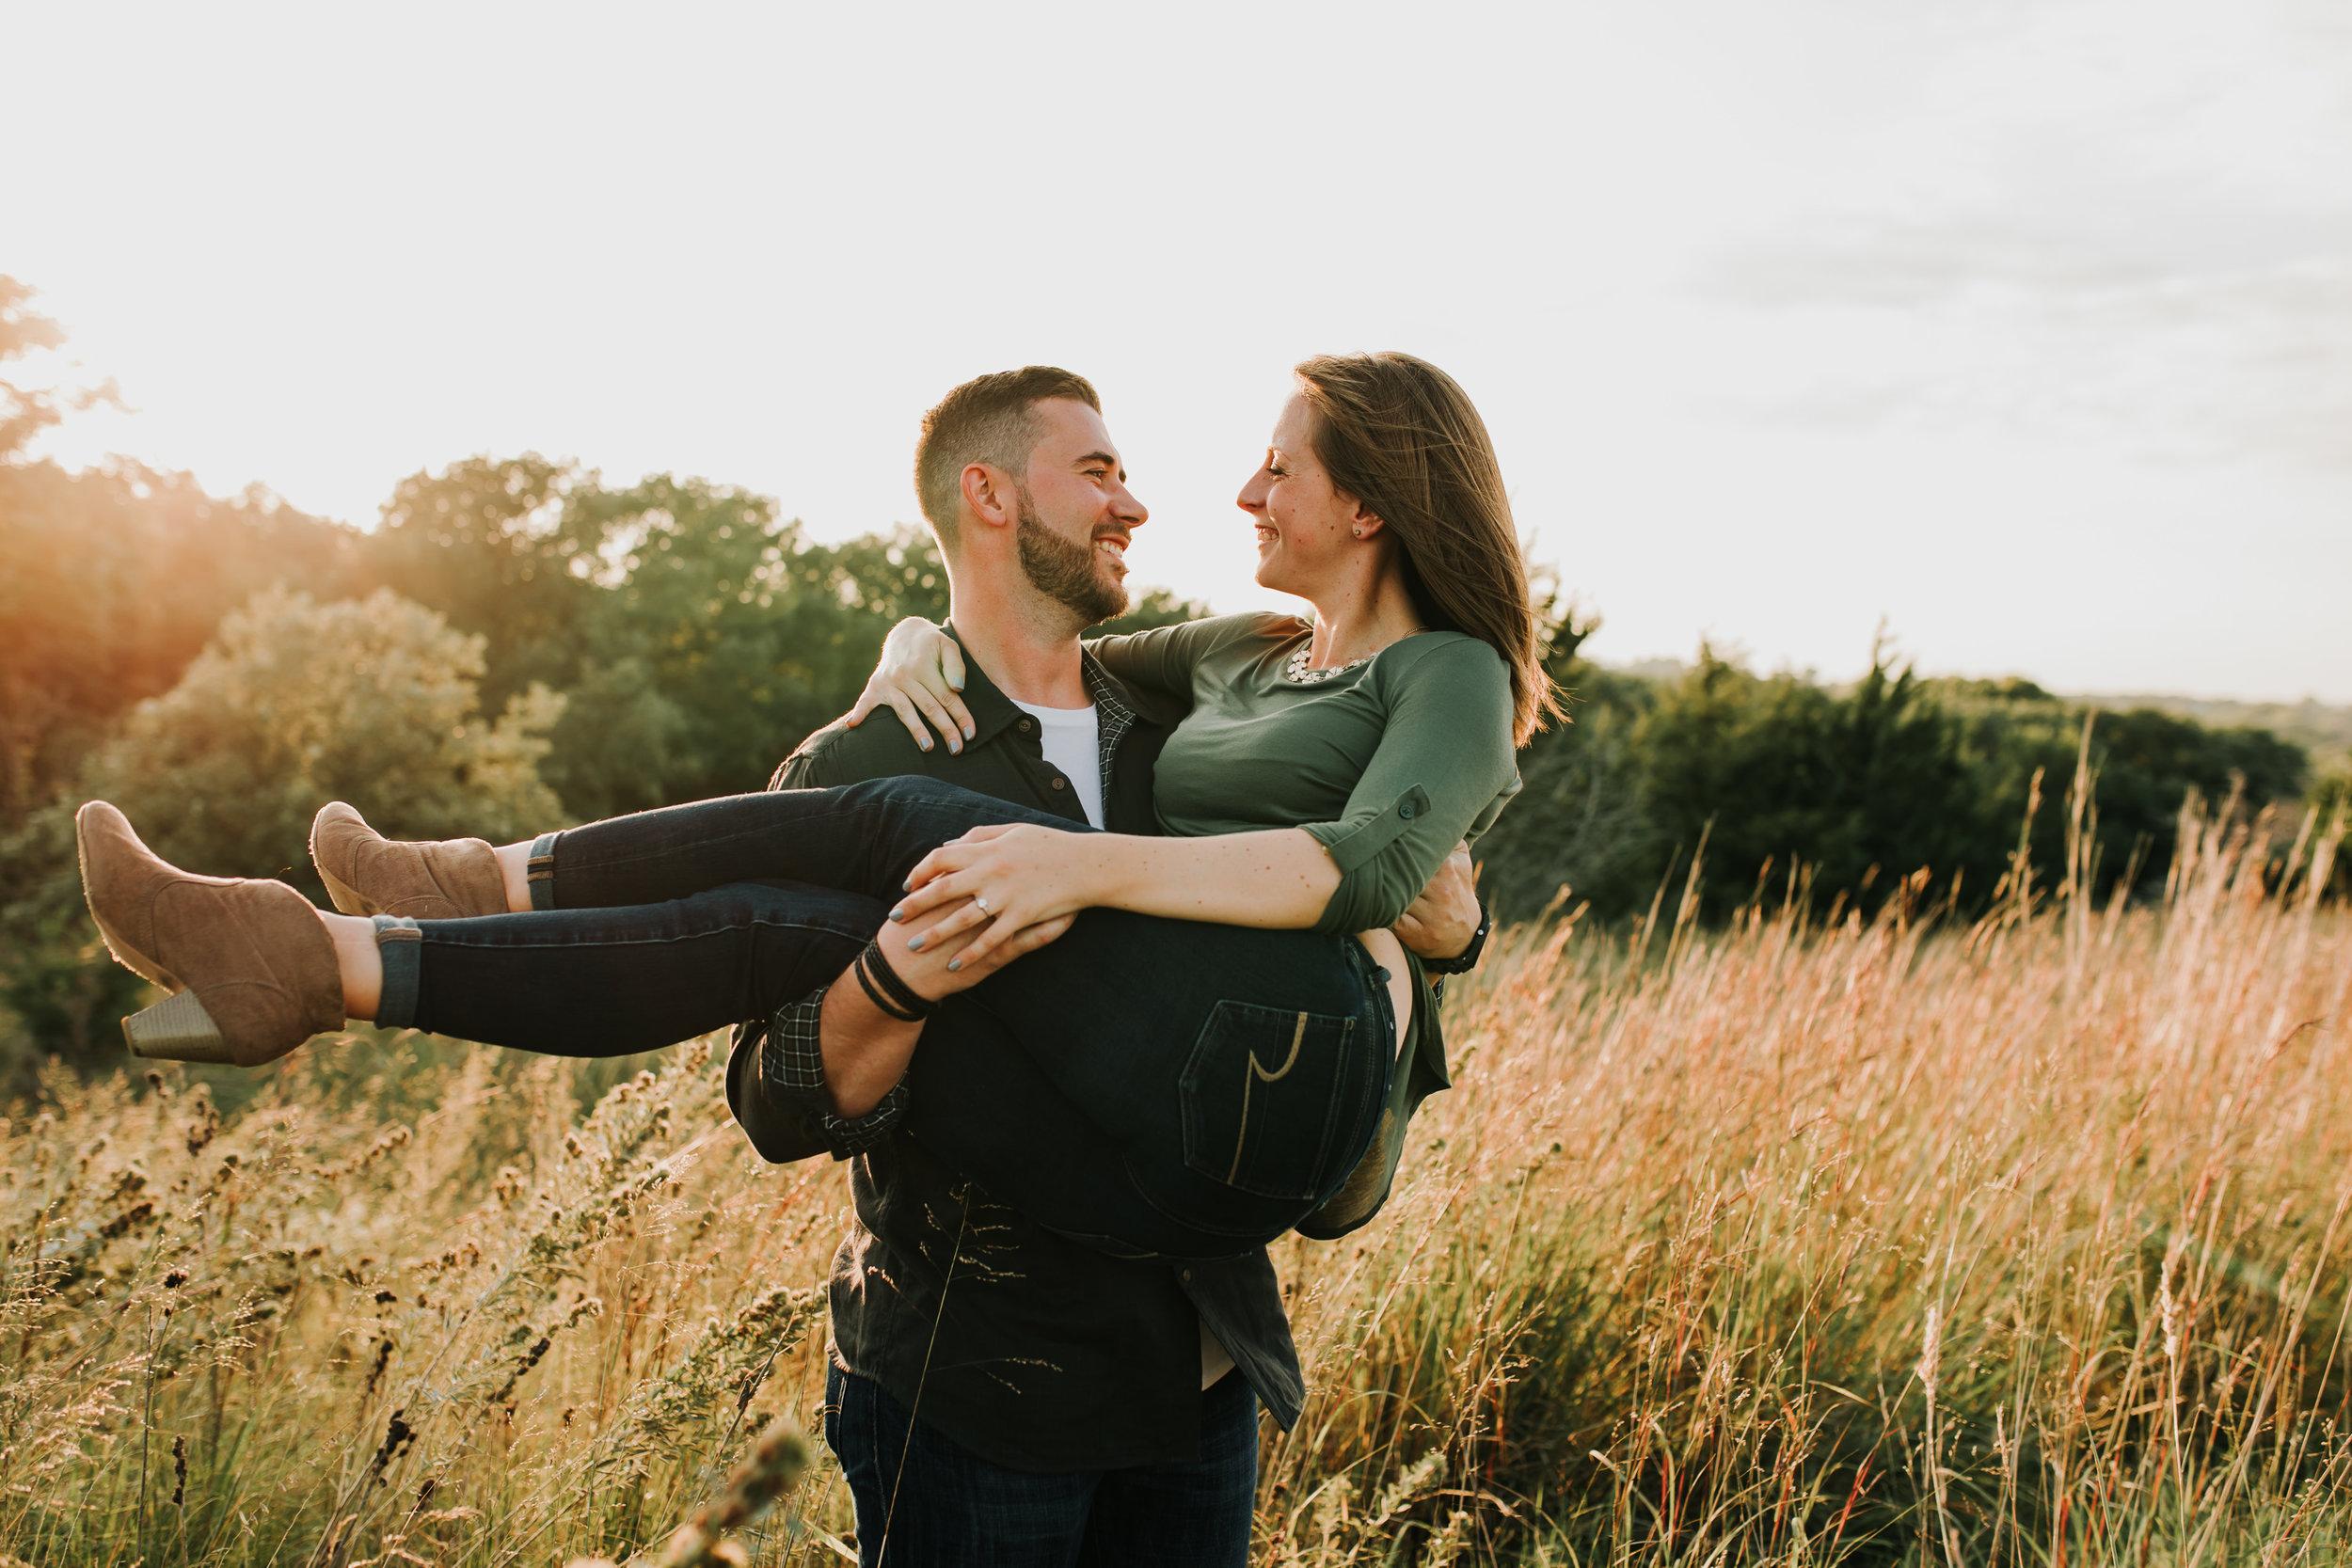 Leslie & Austin - Engaged - Nathaniel Jensen Photography - Omaha Nebraska Wedding Photograper - Engagement Session-59.jpg